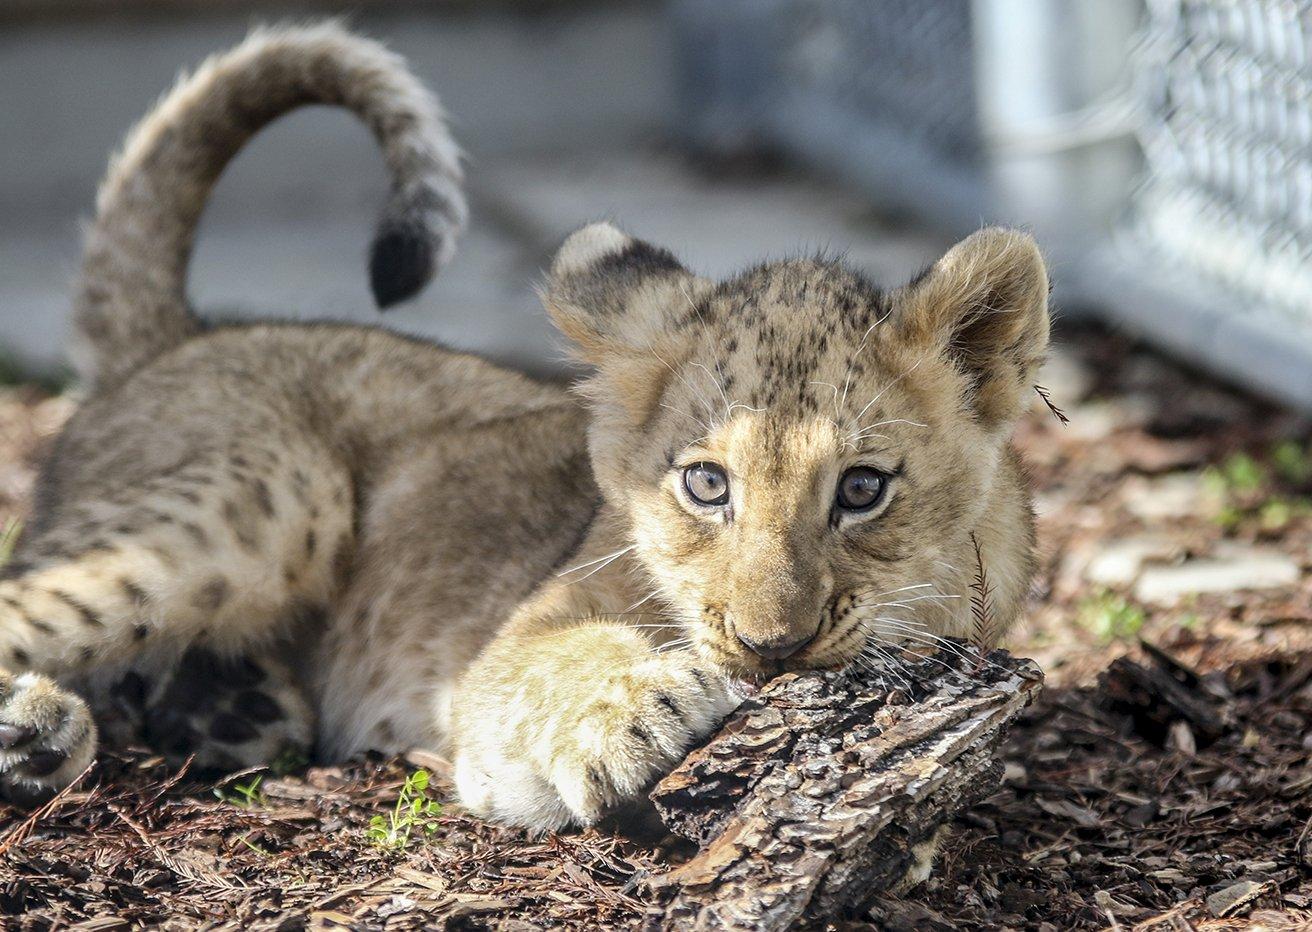 We see your #CuteAnimalTweetOff and raise you a #LionCub! https://t.co/lJizi4TNwA